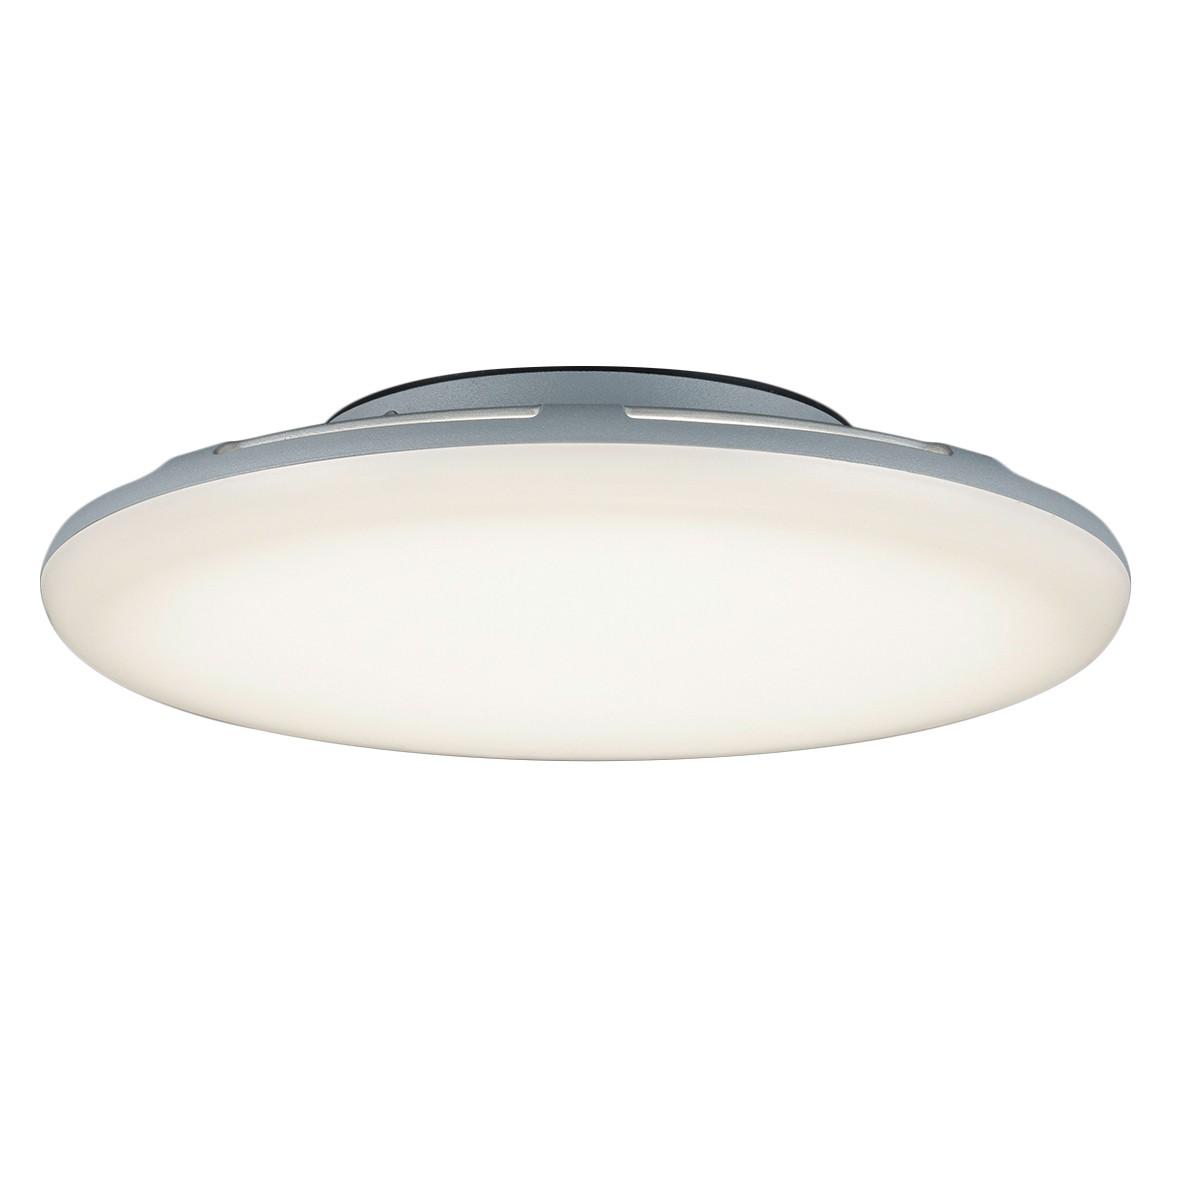 EEK A+, LED-Außenleuchte Bering - Aluminium / Kunststoff - 1-flammig - 27 - Titan, Trio